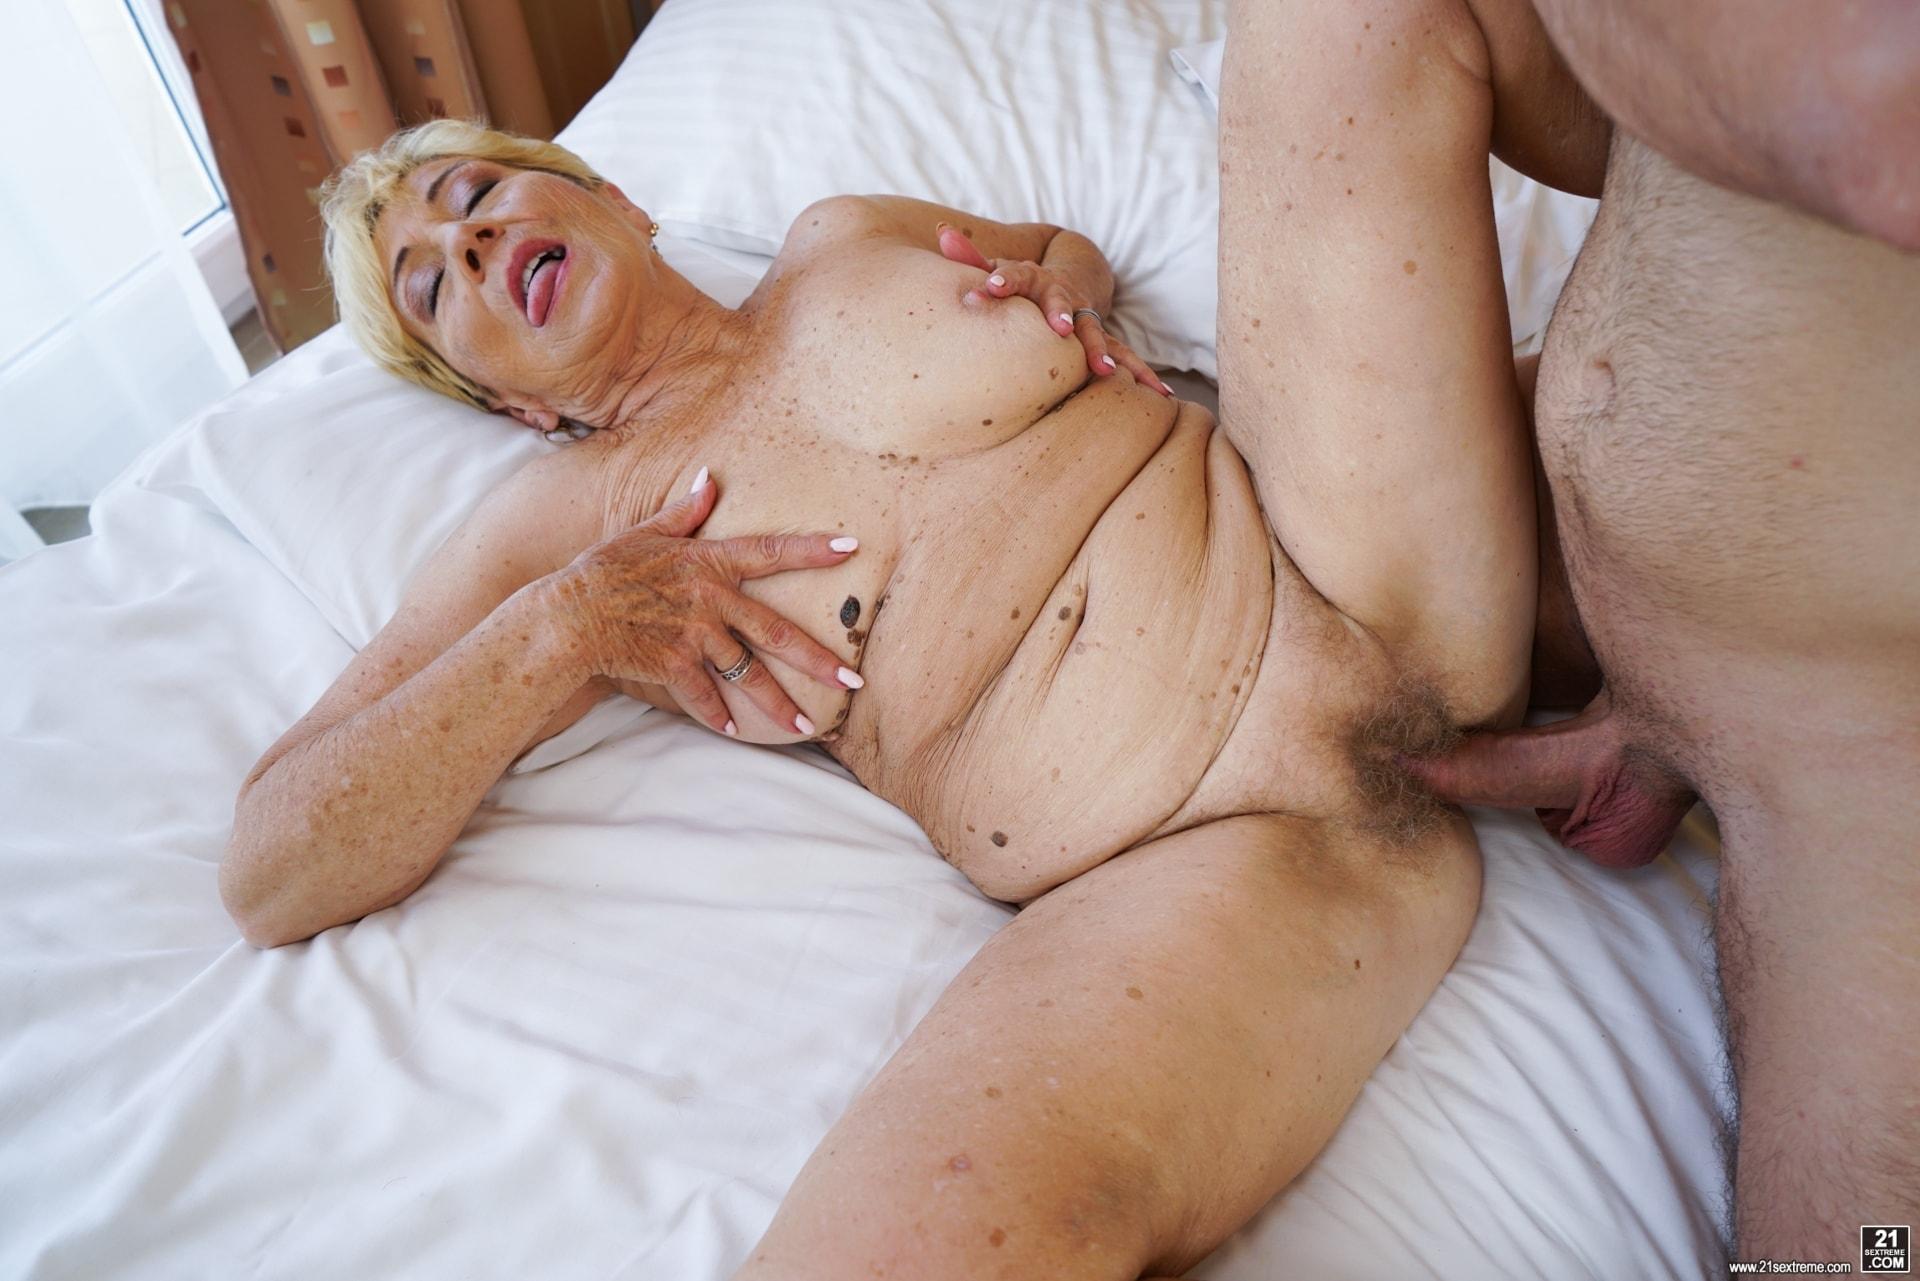 21Sextury 'Old Passion' starring Malya (Photo 108)